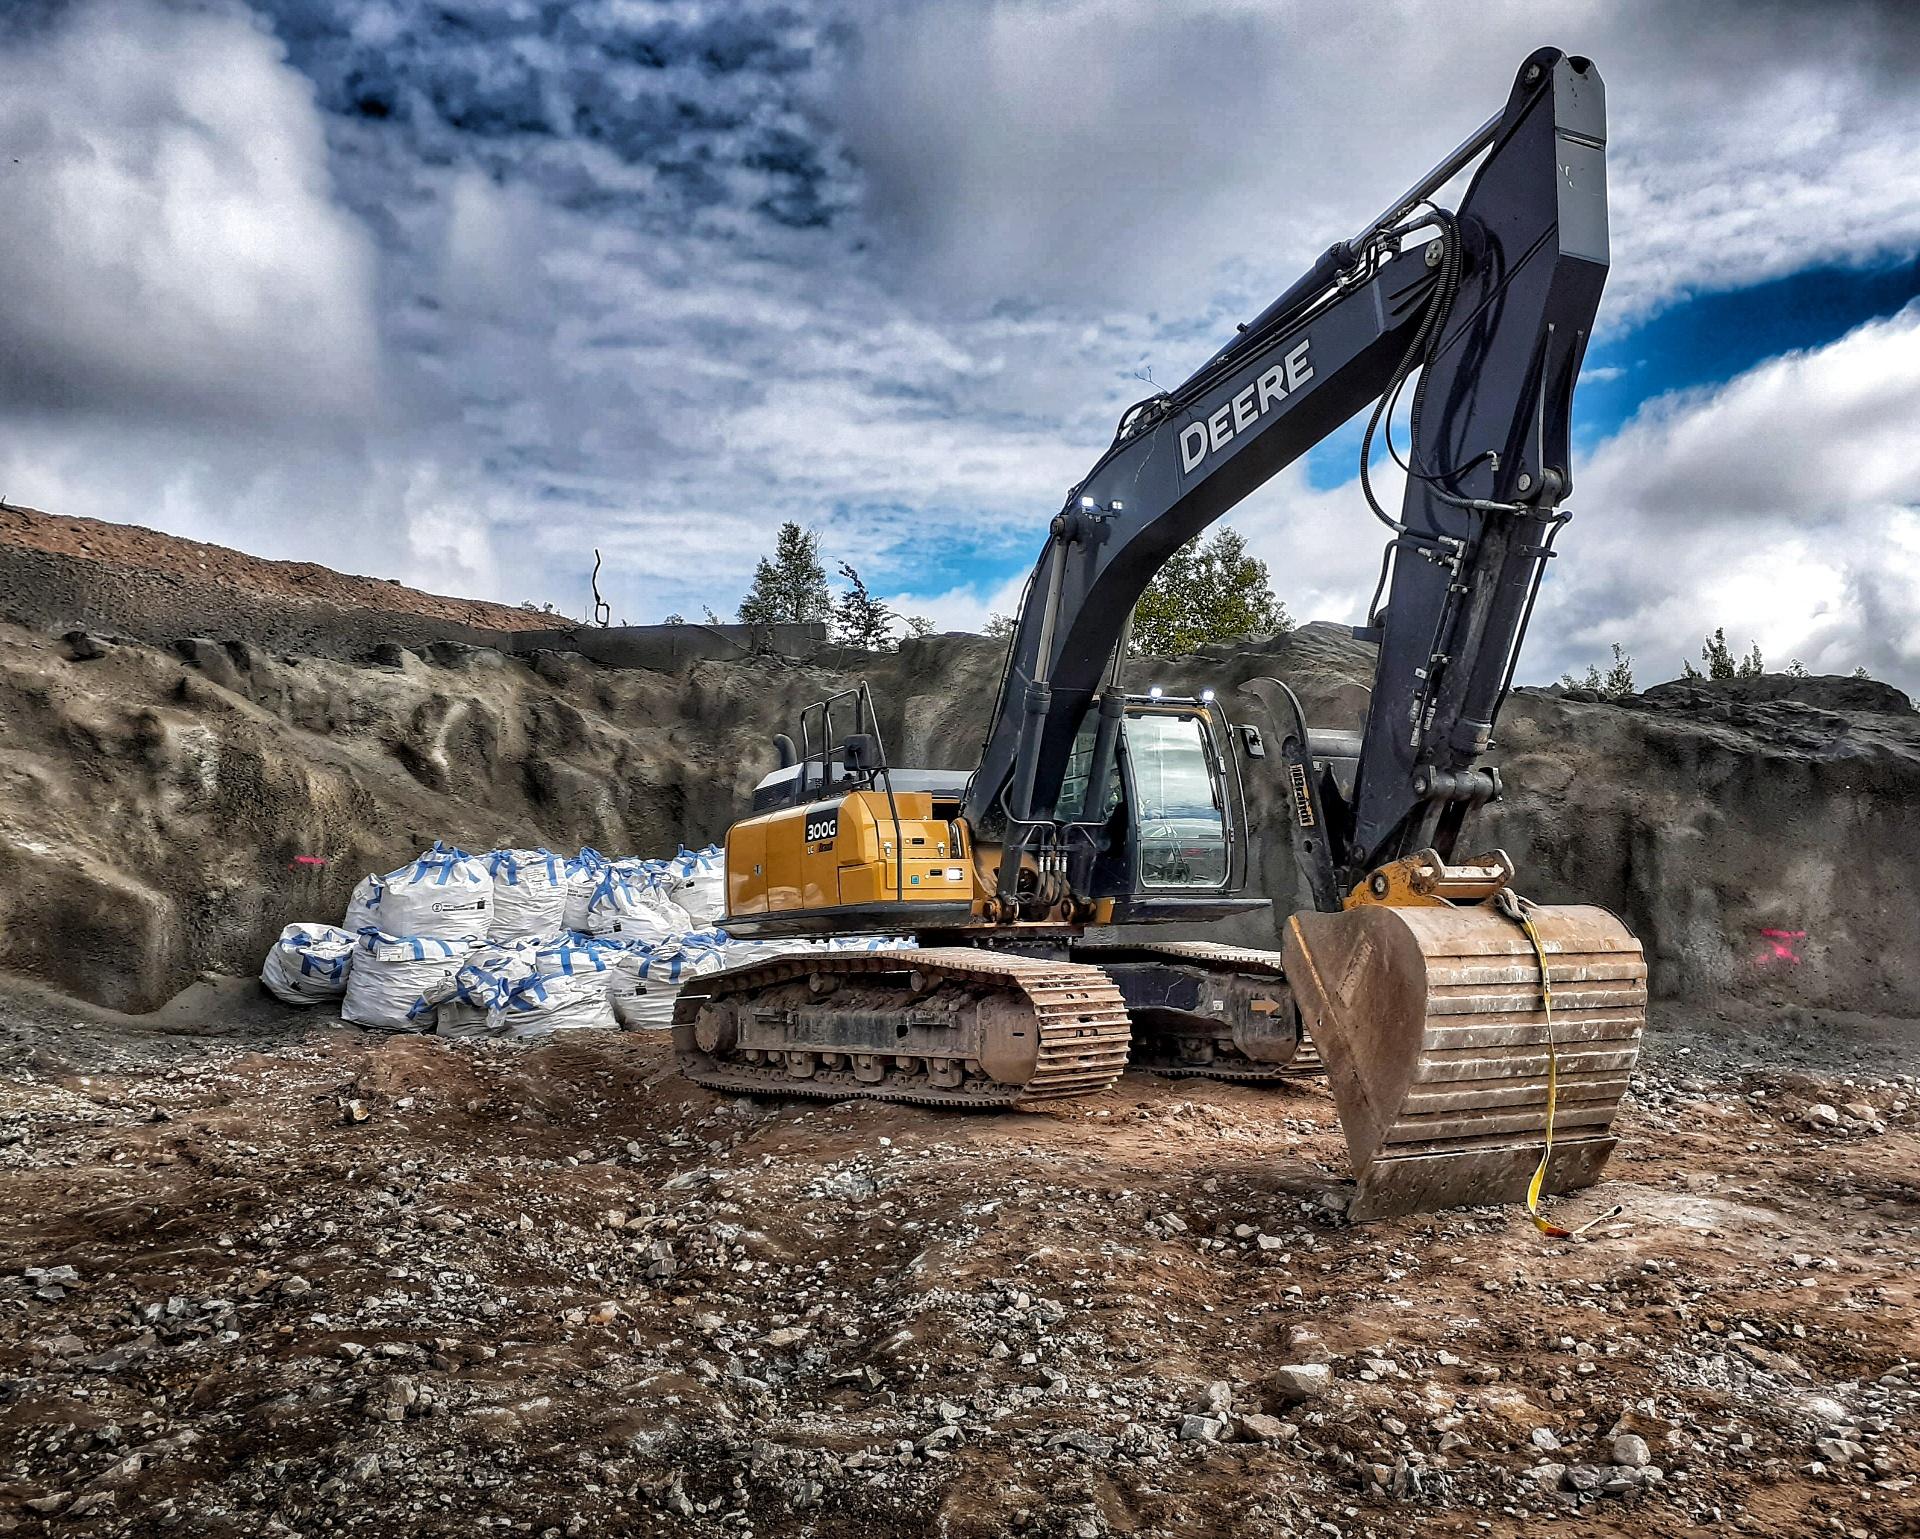 Excavator with contaminated materials behind